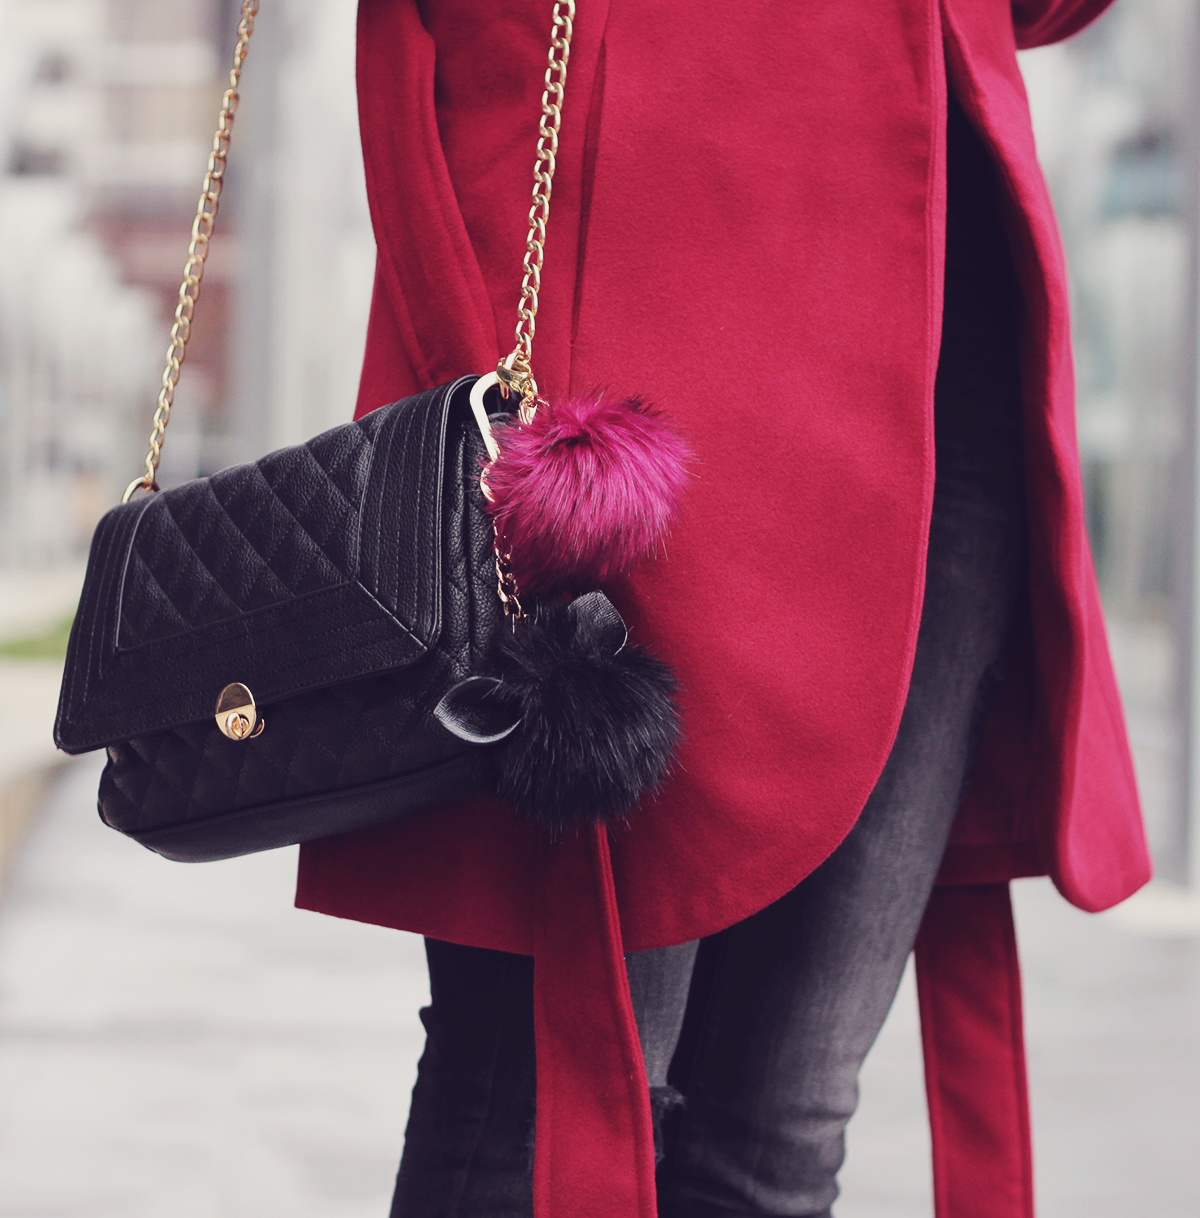 chain clutch bag and pom-poms